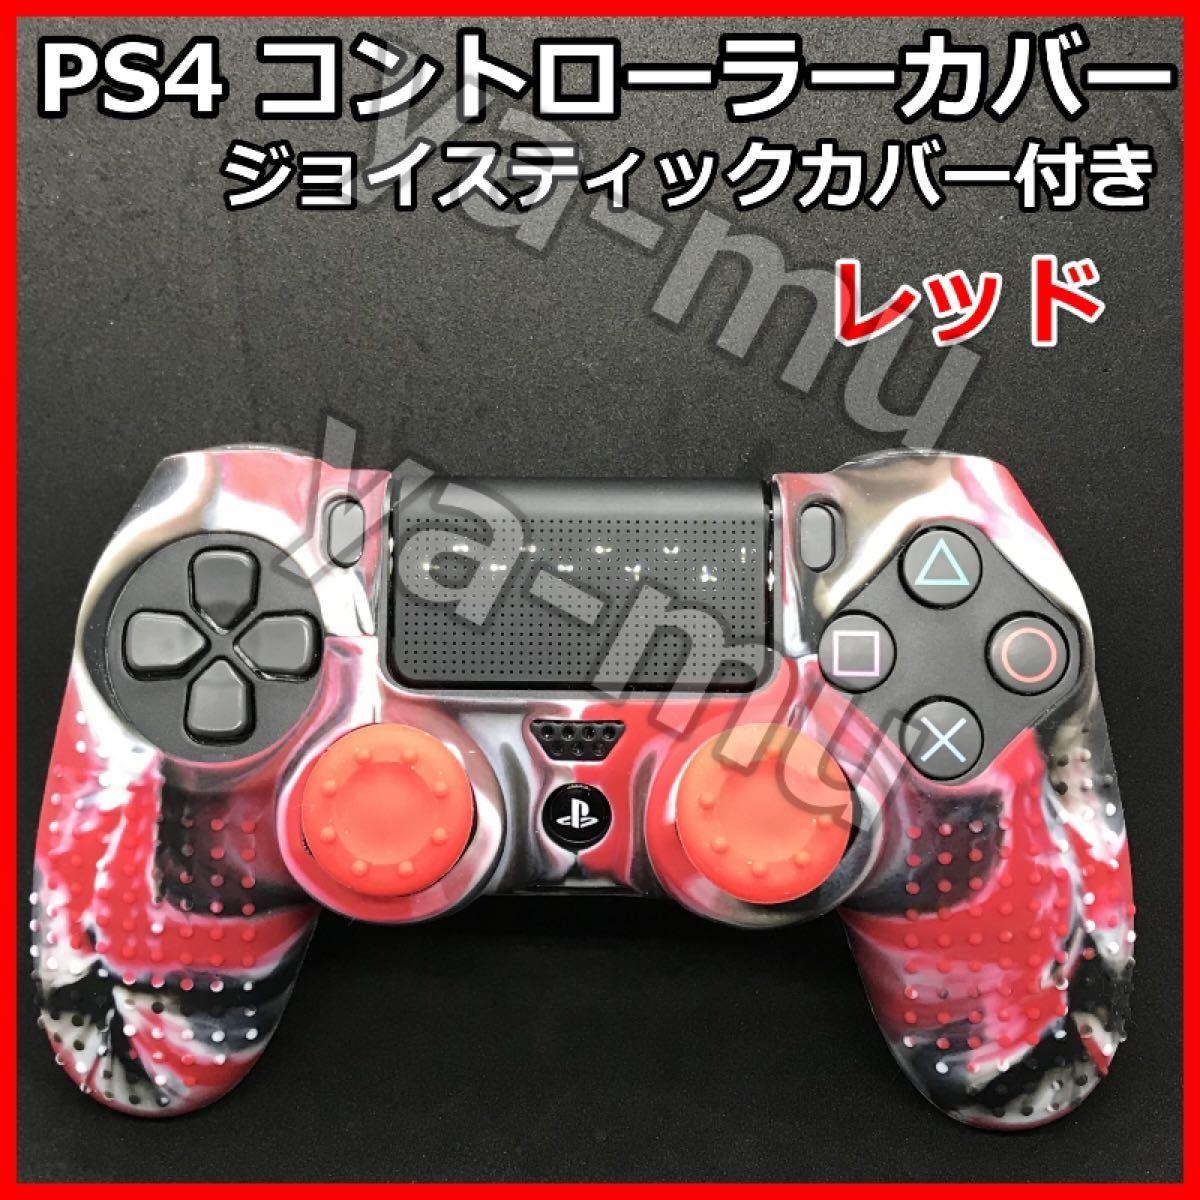 PS4 プレステ コントローラー カバー シリコン 防止 ゲーミング グッズ 迷彩 赤 レッド